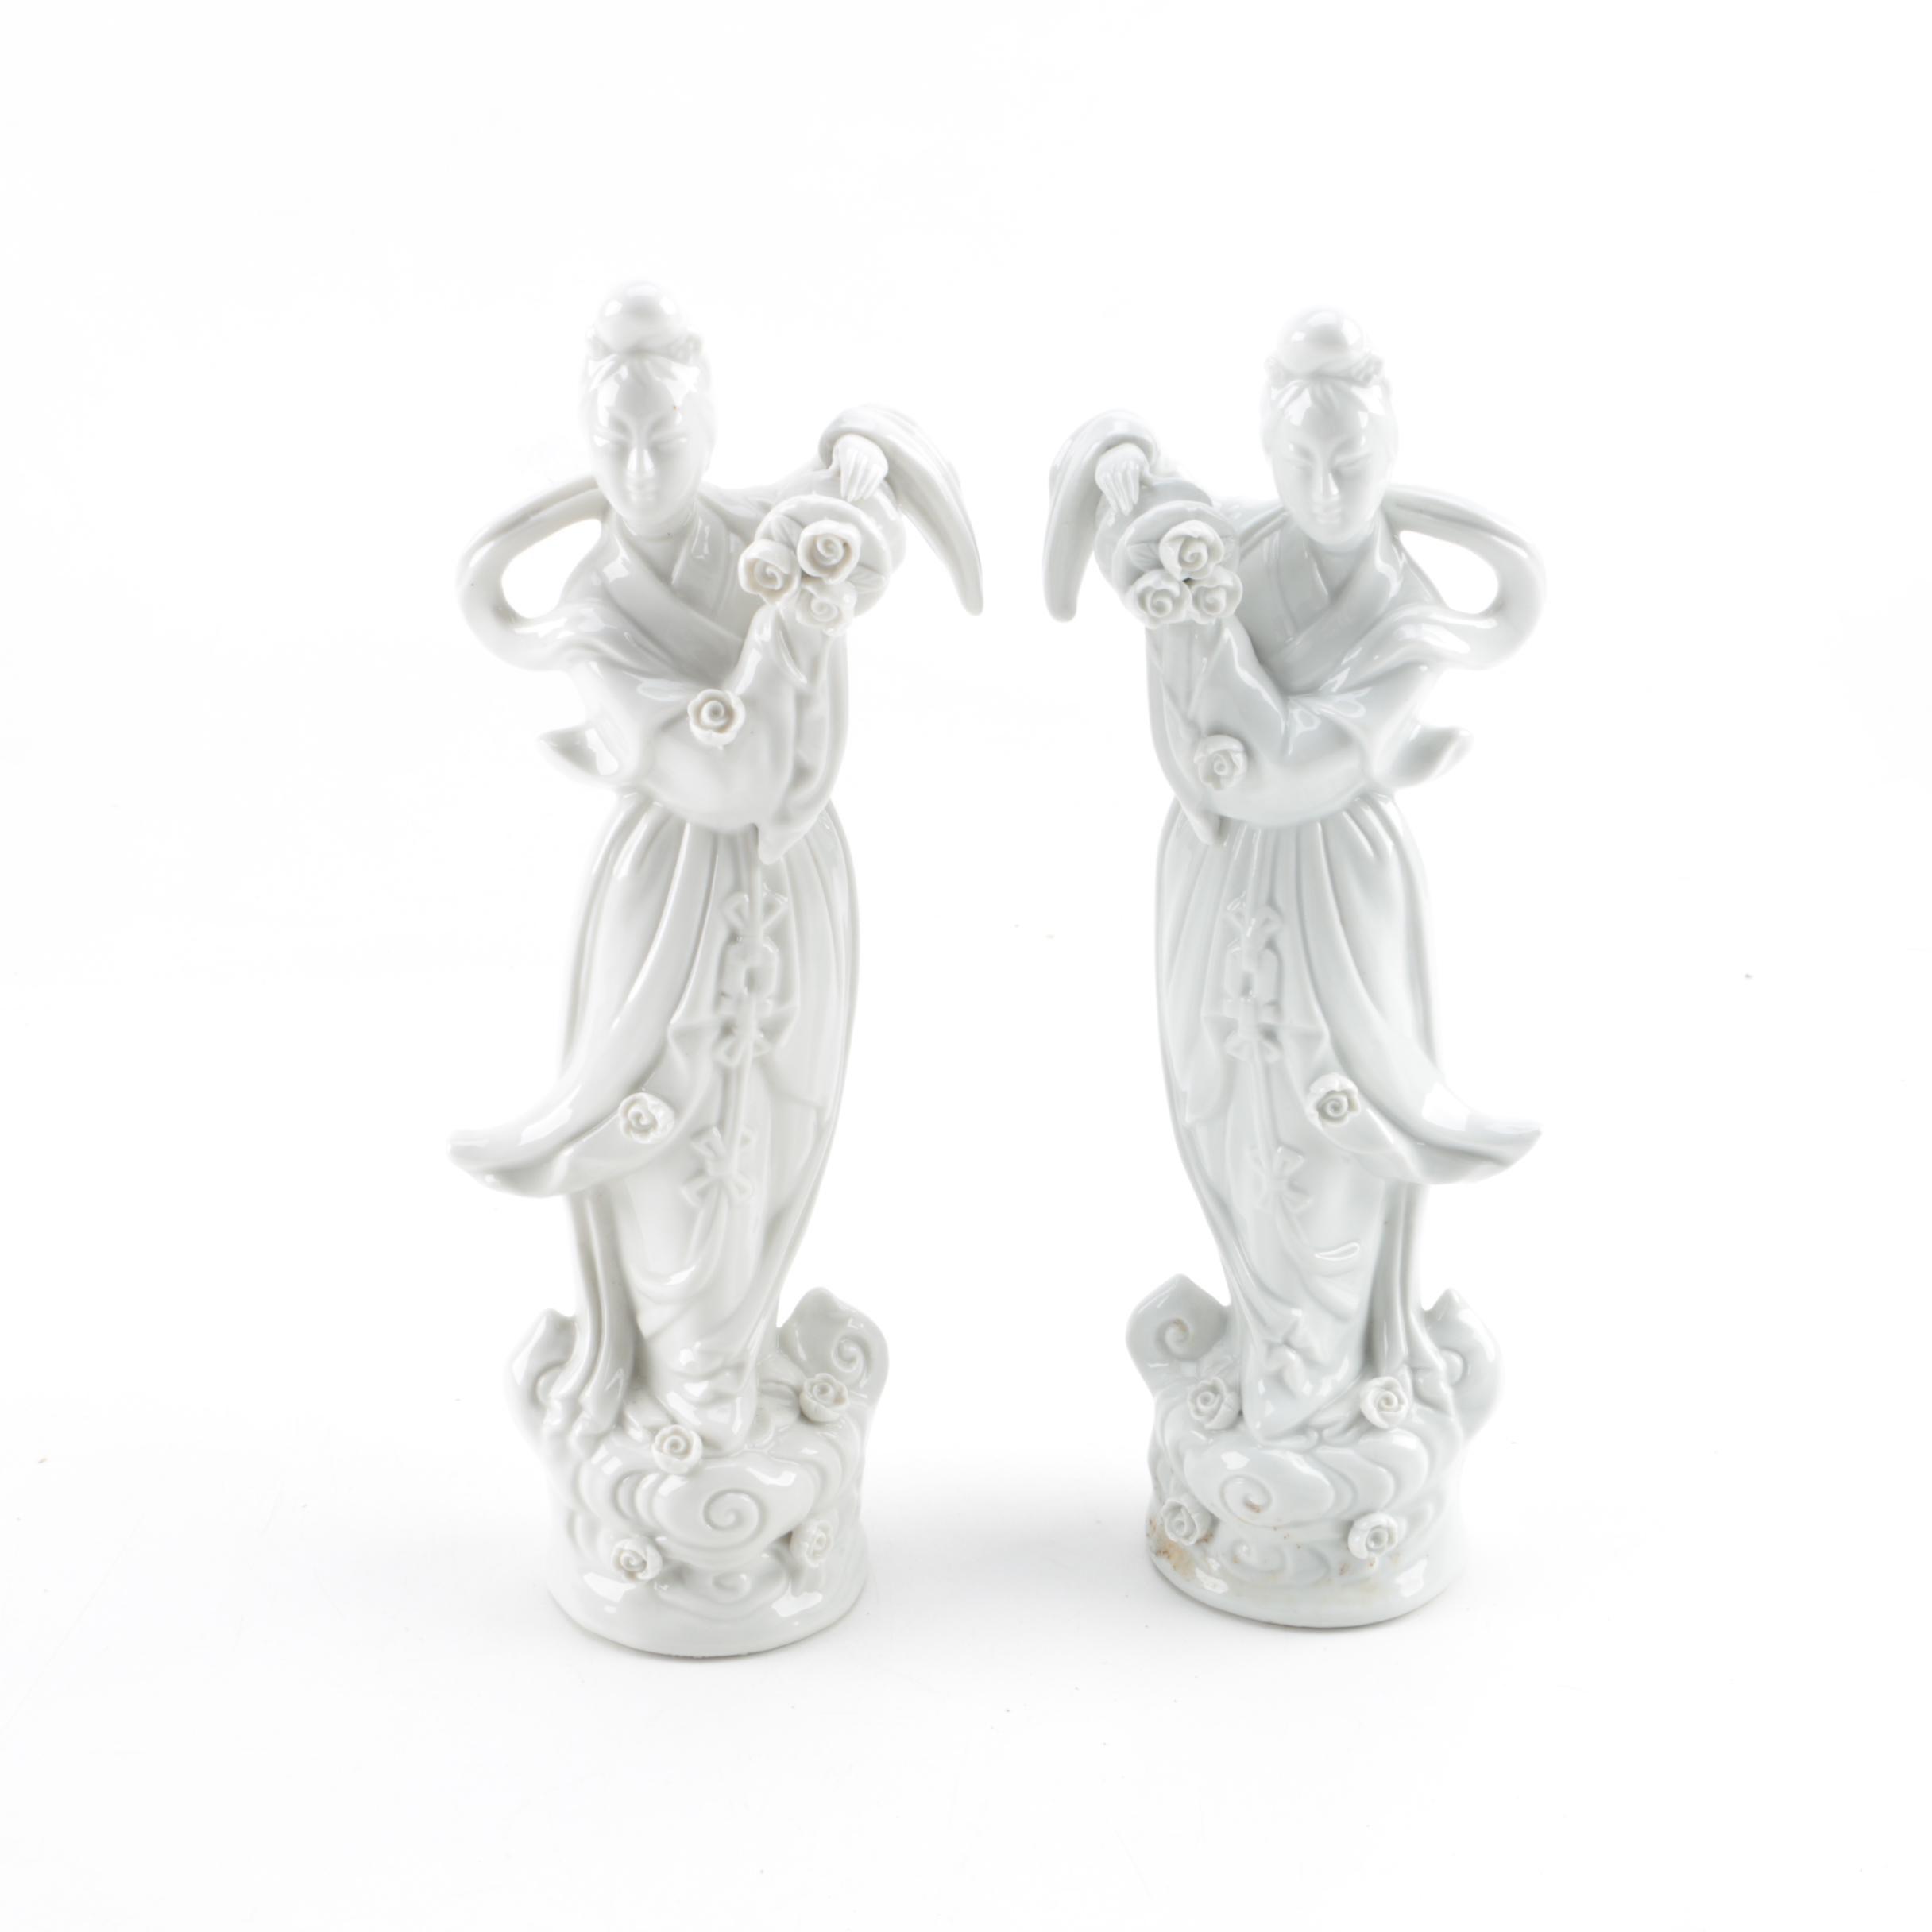 Pair of Chines Blanc-de-Chine Women Figurines